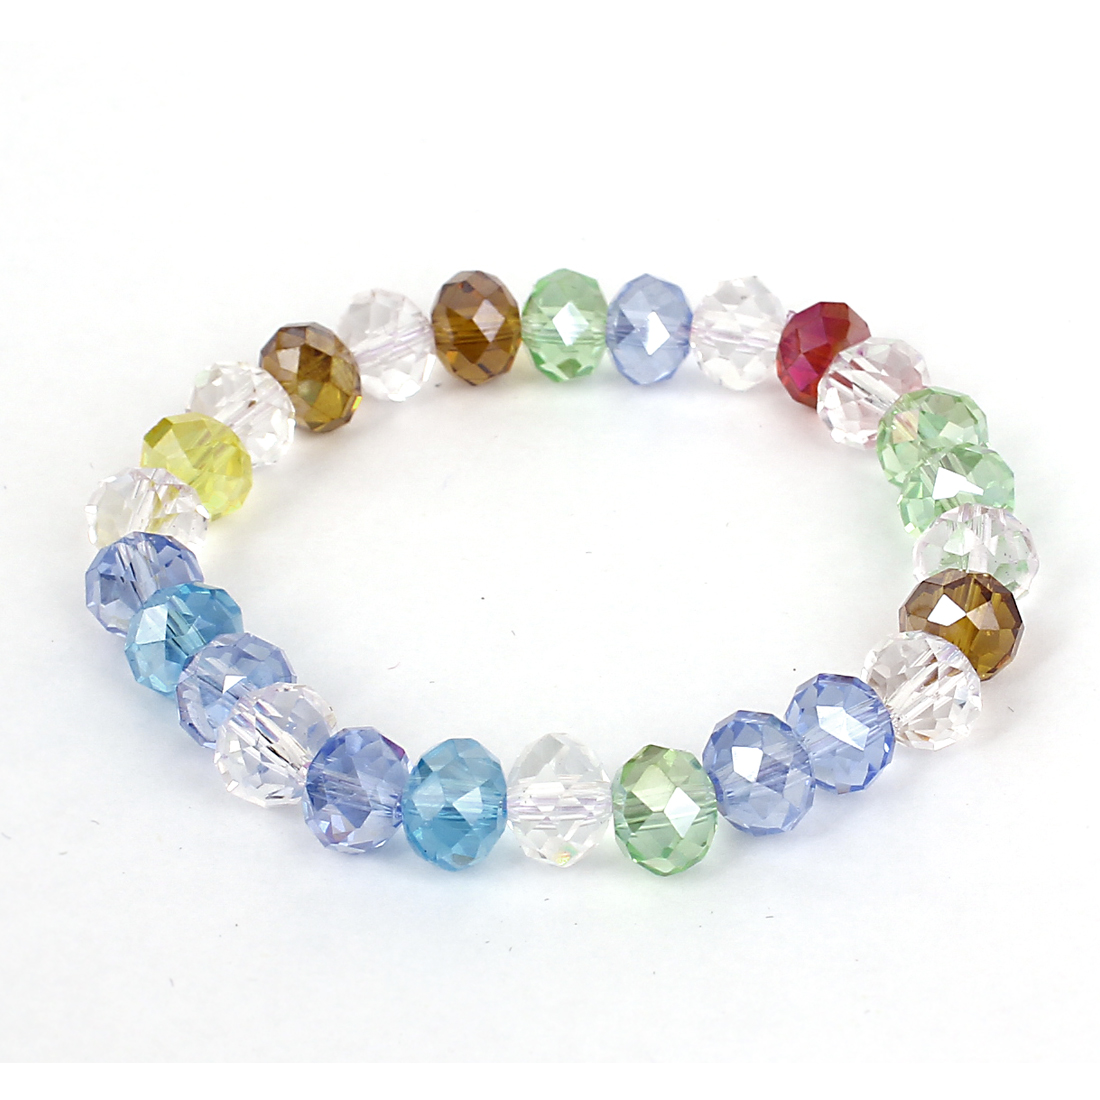 Lady Faux Crystal Decor Elastic Wrist Chain Bangle Bracelet Assorted Color